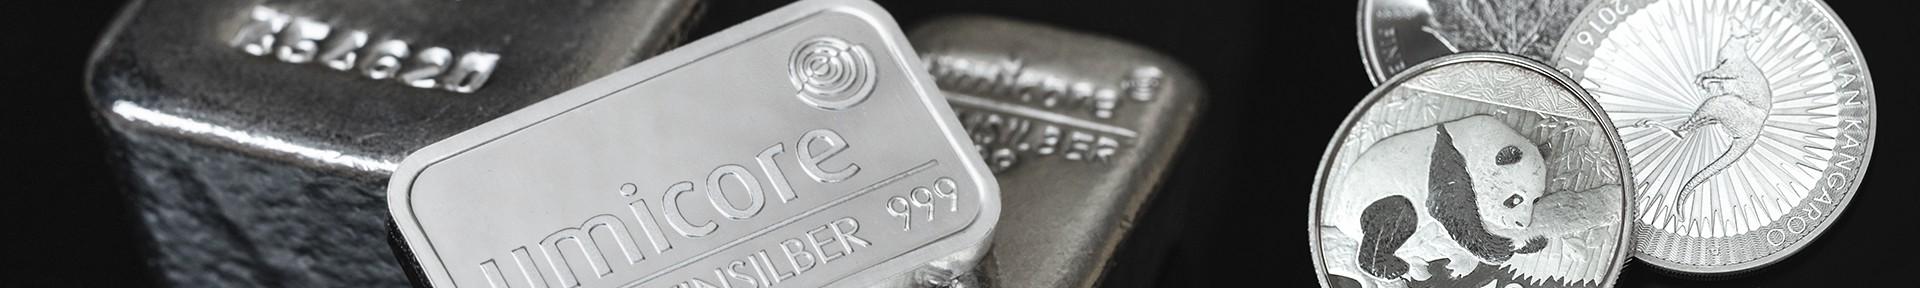 Silber kaufen bei Goldwechselhaus